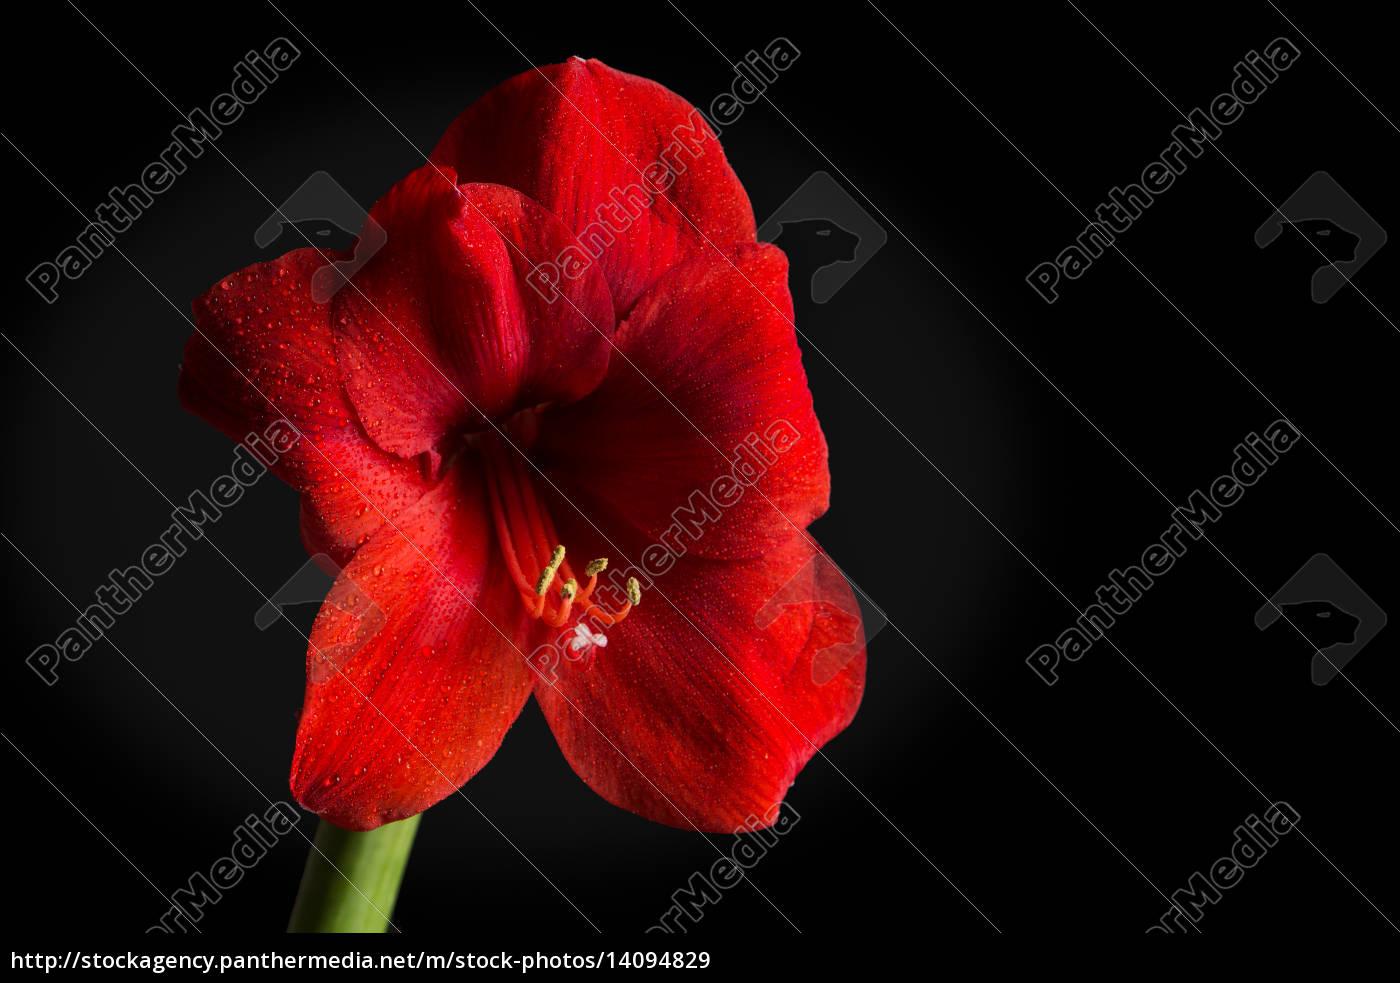 red, amaryllis, flower, on, black, background. - 14094829